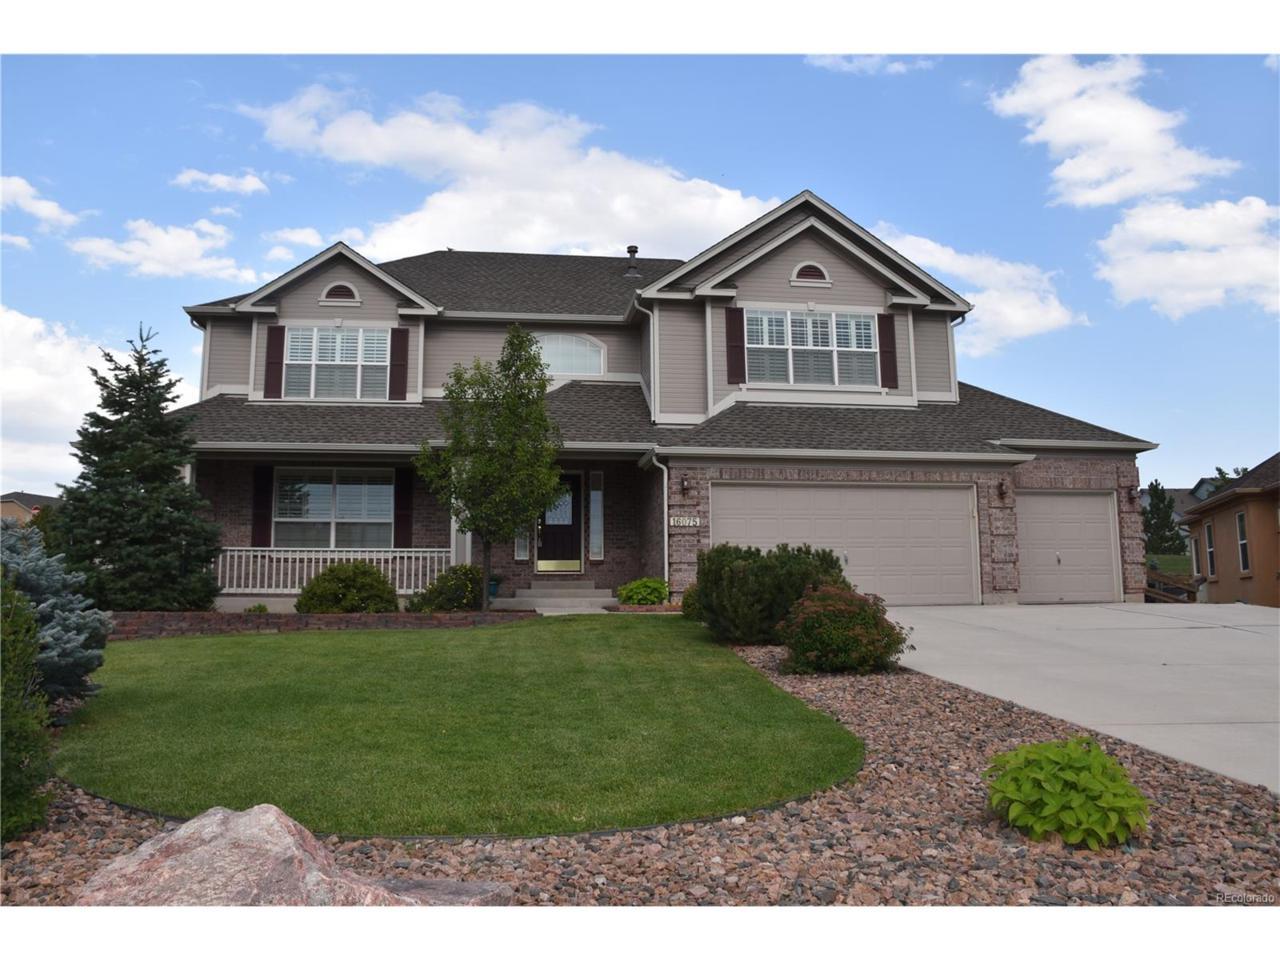 16075 Bridle Ridge Drive, Monument, CO 80132 (MLS #5349723) :: 8z Real Estate